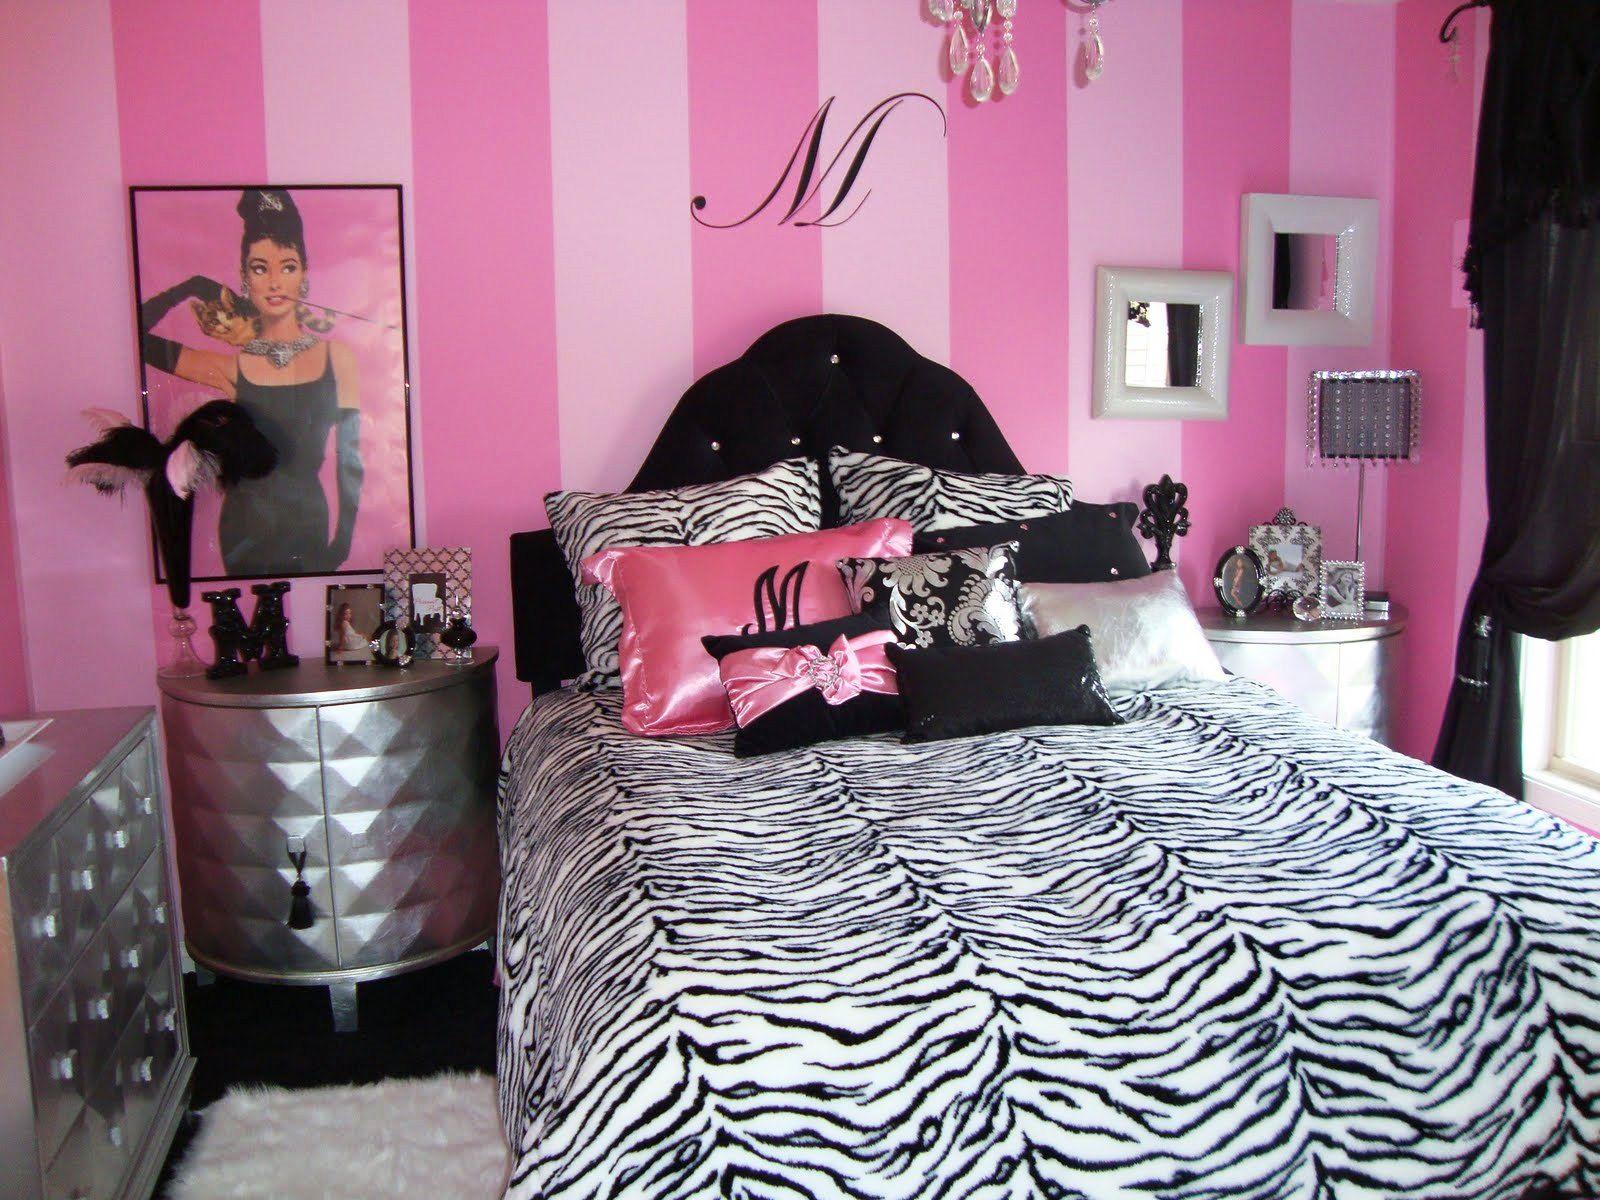 Zebra bedroom decorating ideas cute zebra bedroom decor zebra